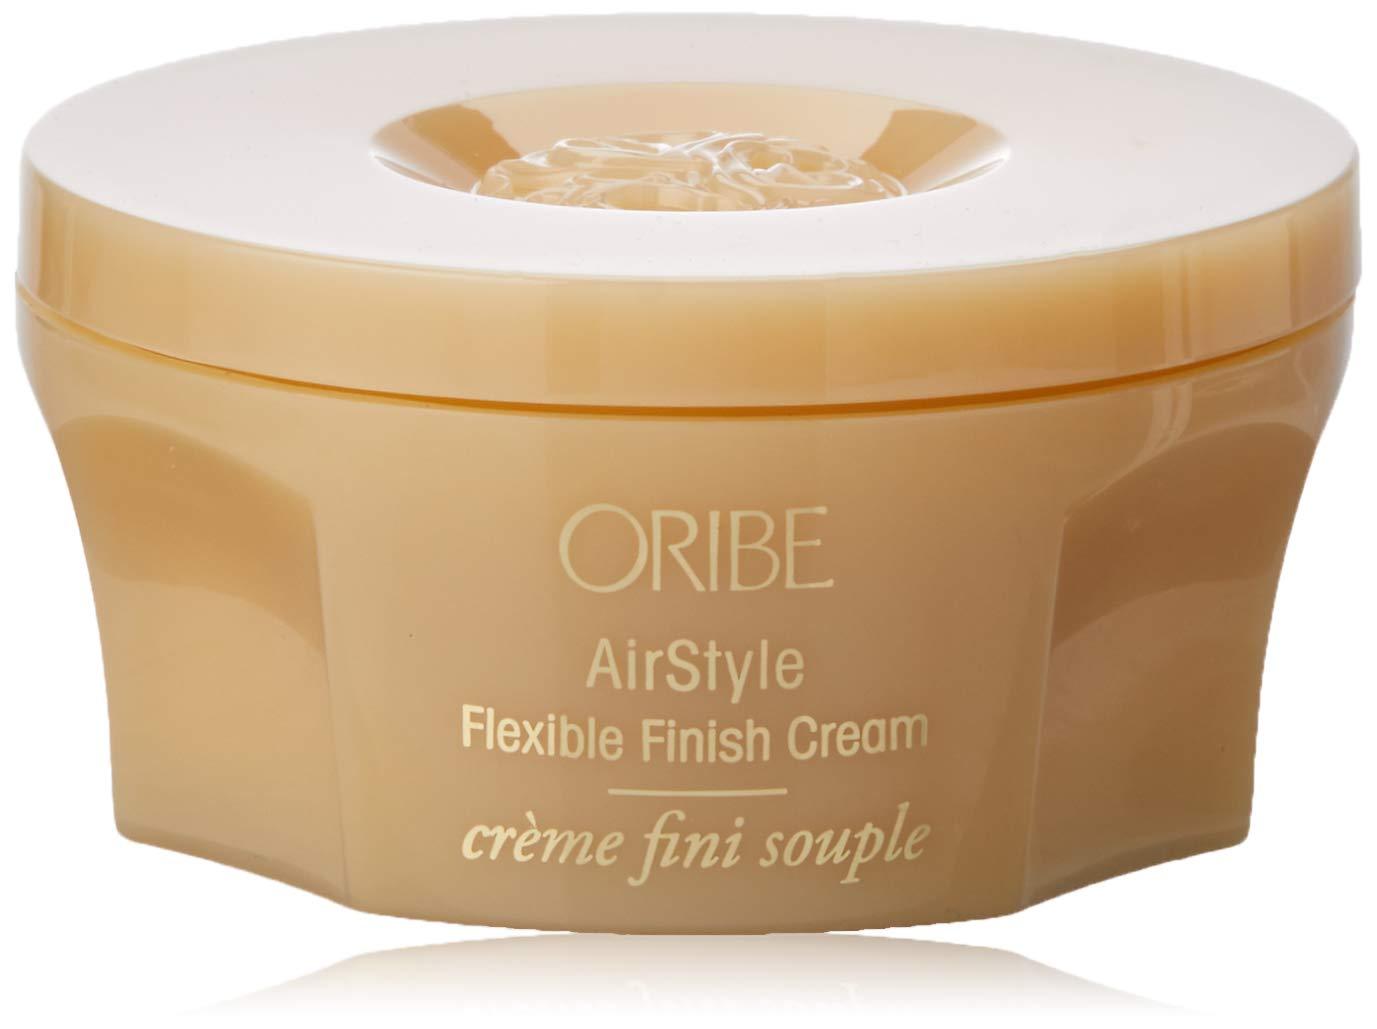 ORIBE Airstyle Flexible Finish Cream, 1.7 oz